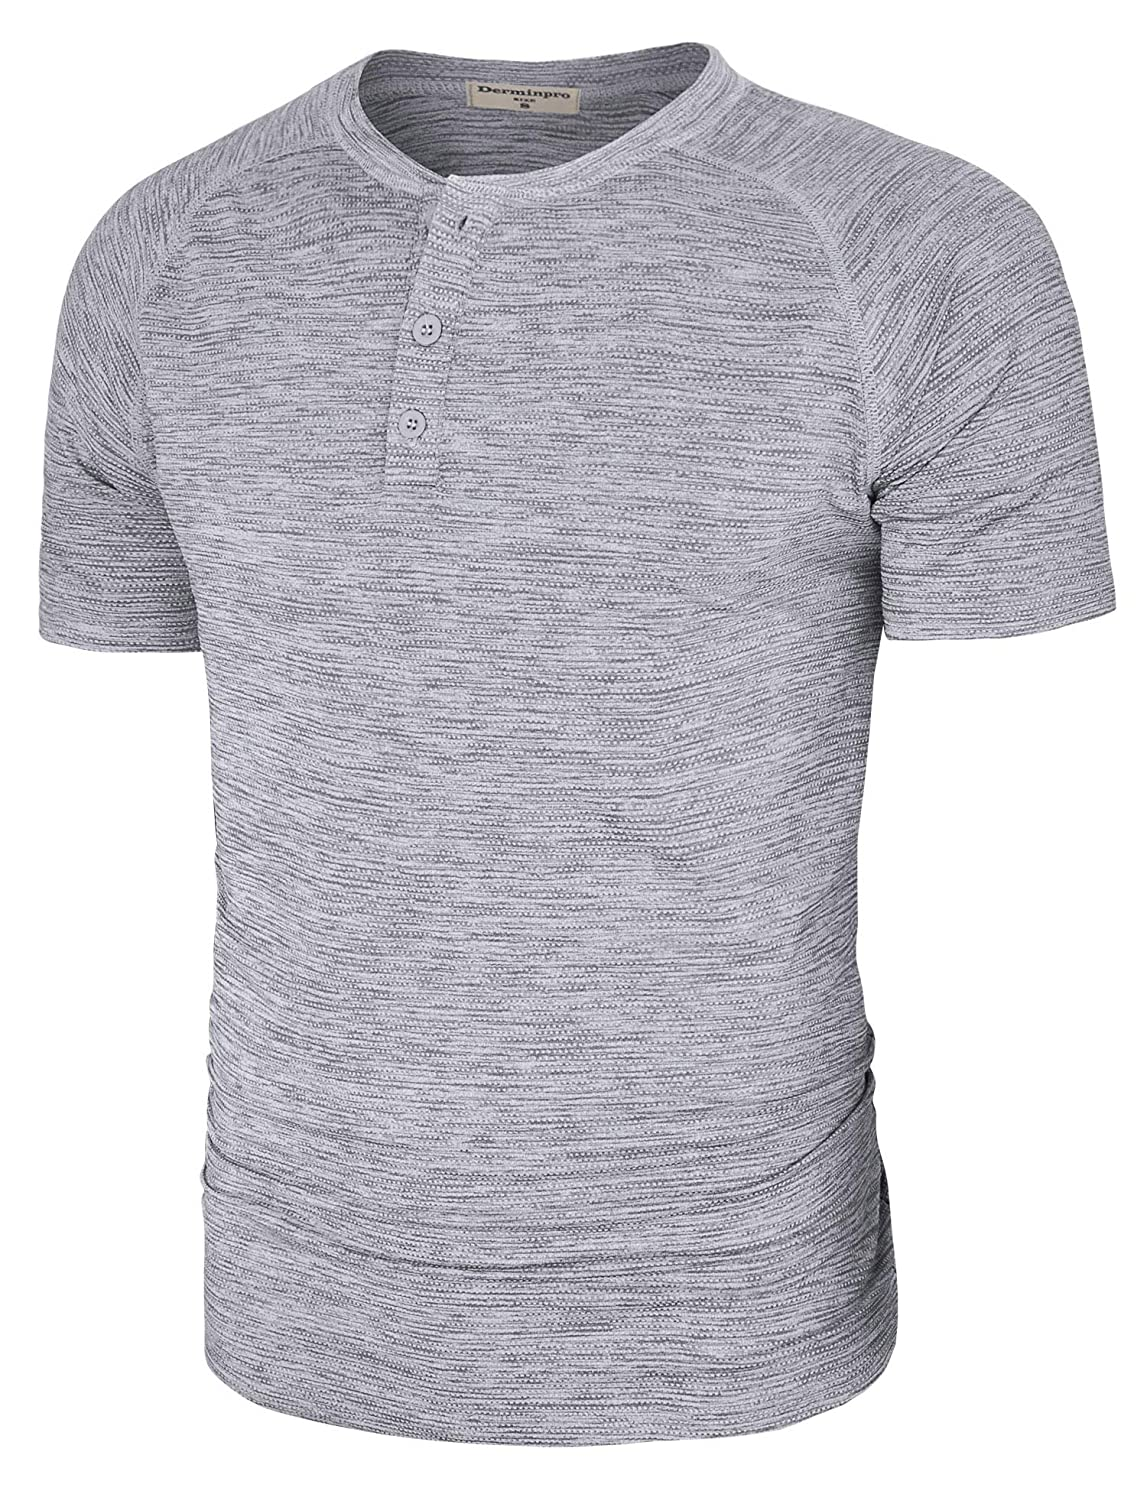 Derminpro Men's Casual Quick Dry Henley T Shirts Short Sleeve Raglan Tee with 3 Buttons